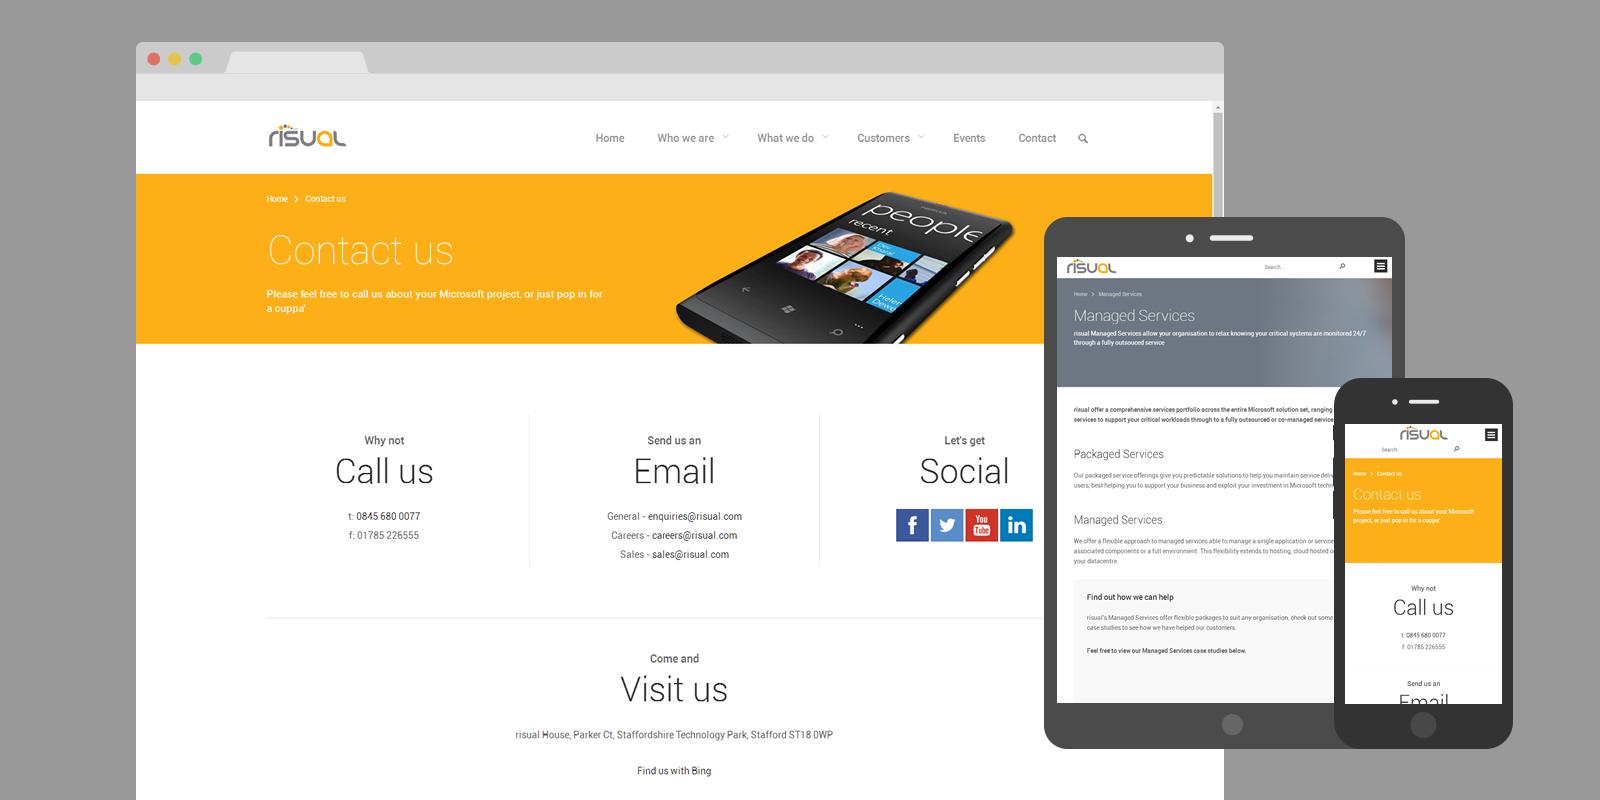 PinkPetrol SharePoint Design Branding - risual